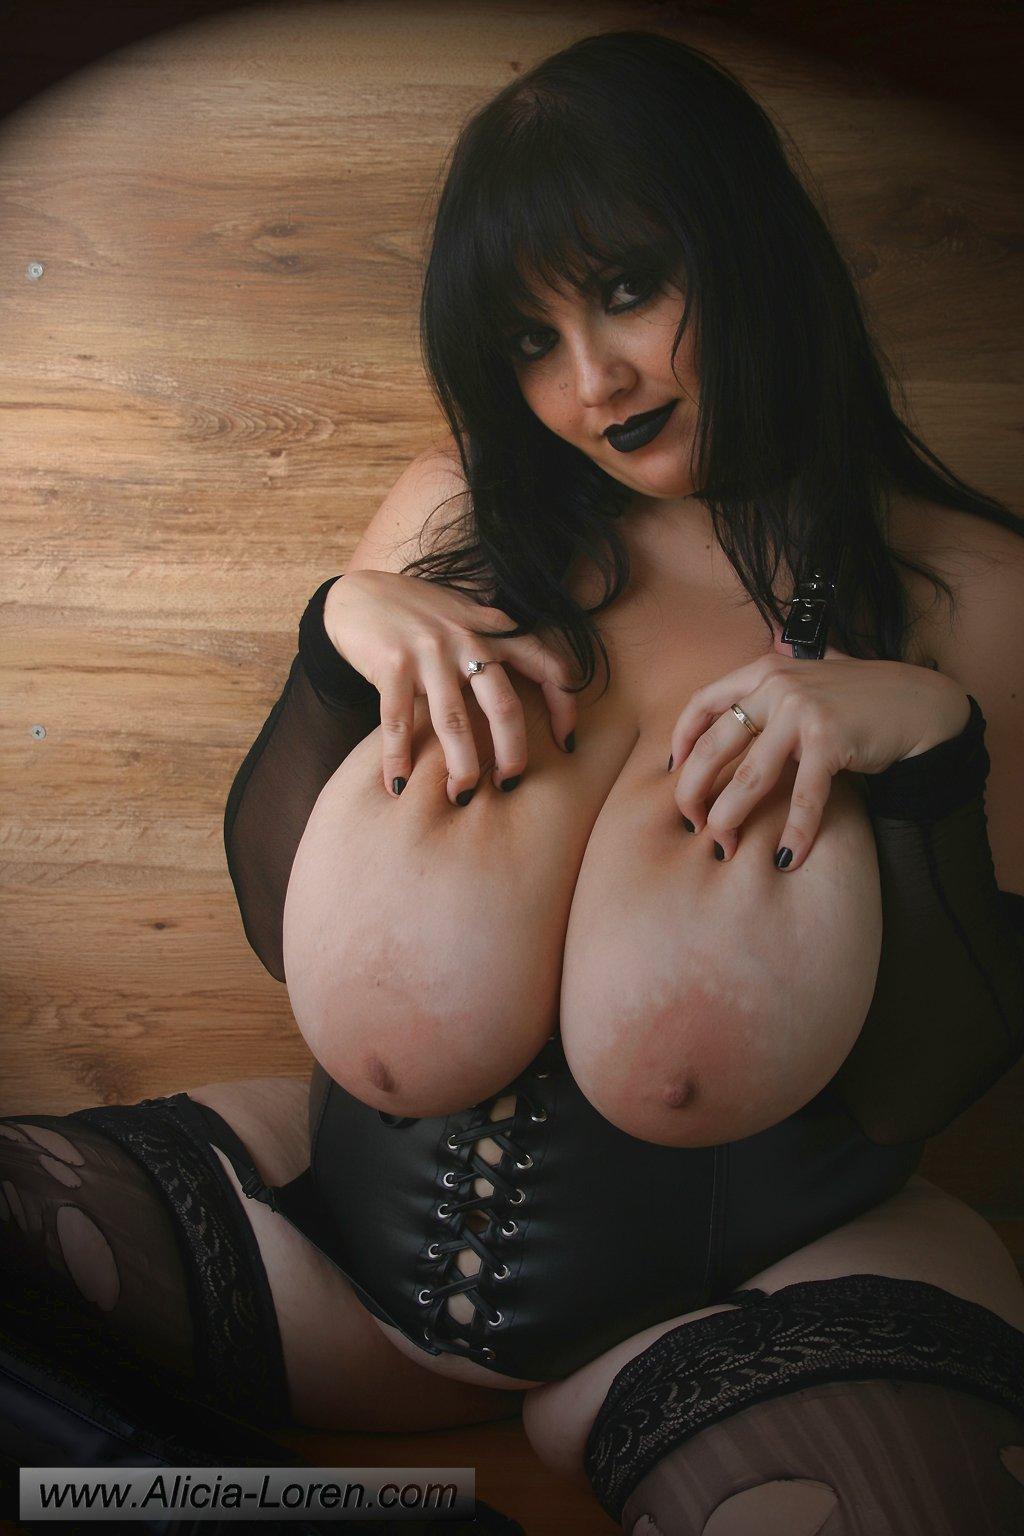 Alicia Loren And Gya Roberts Pictures Porn alicia loren fucking